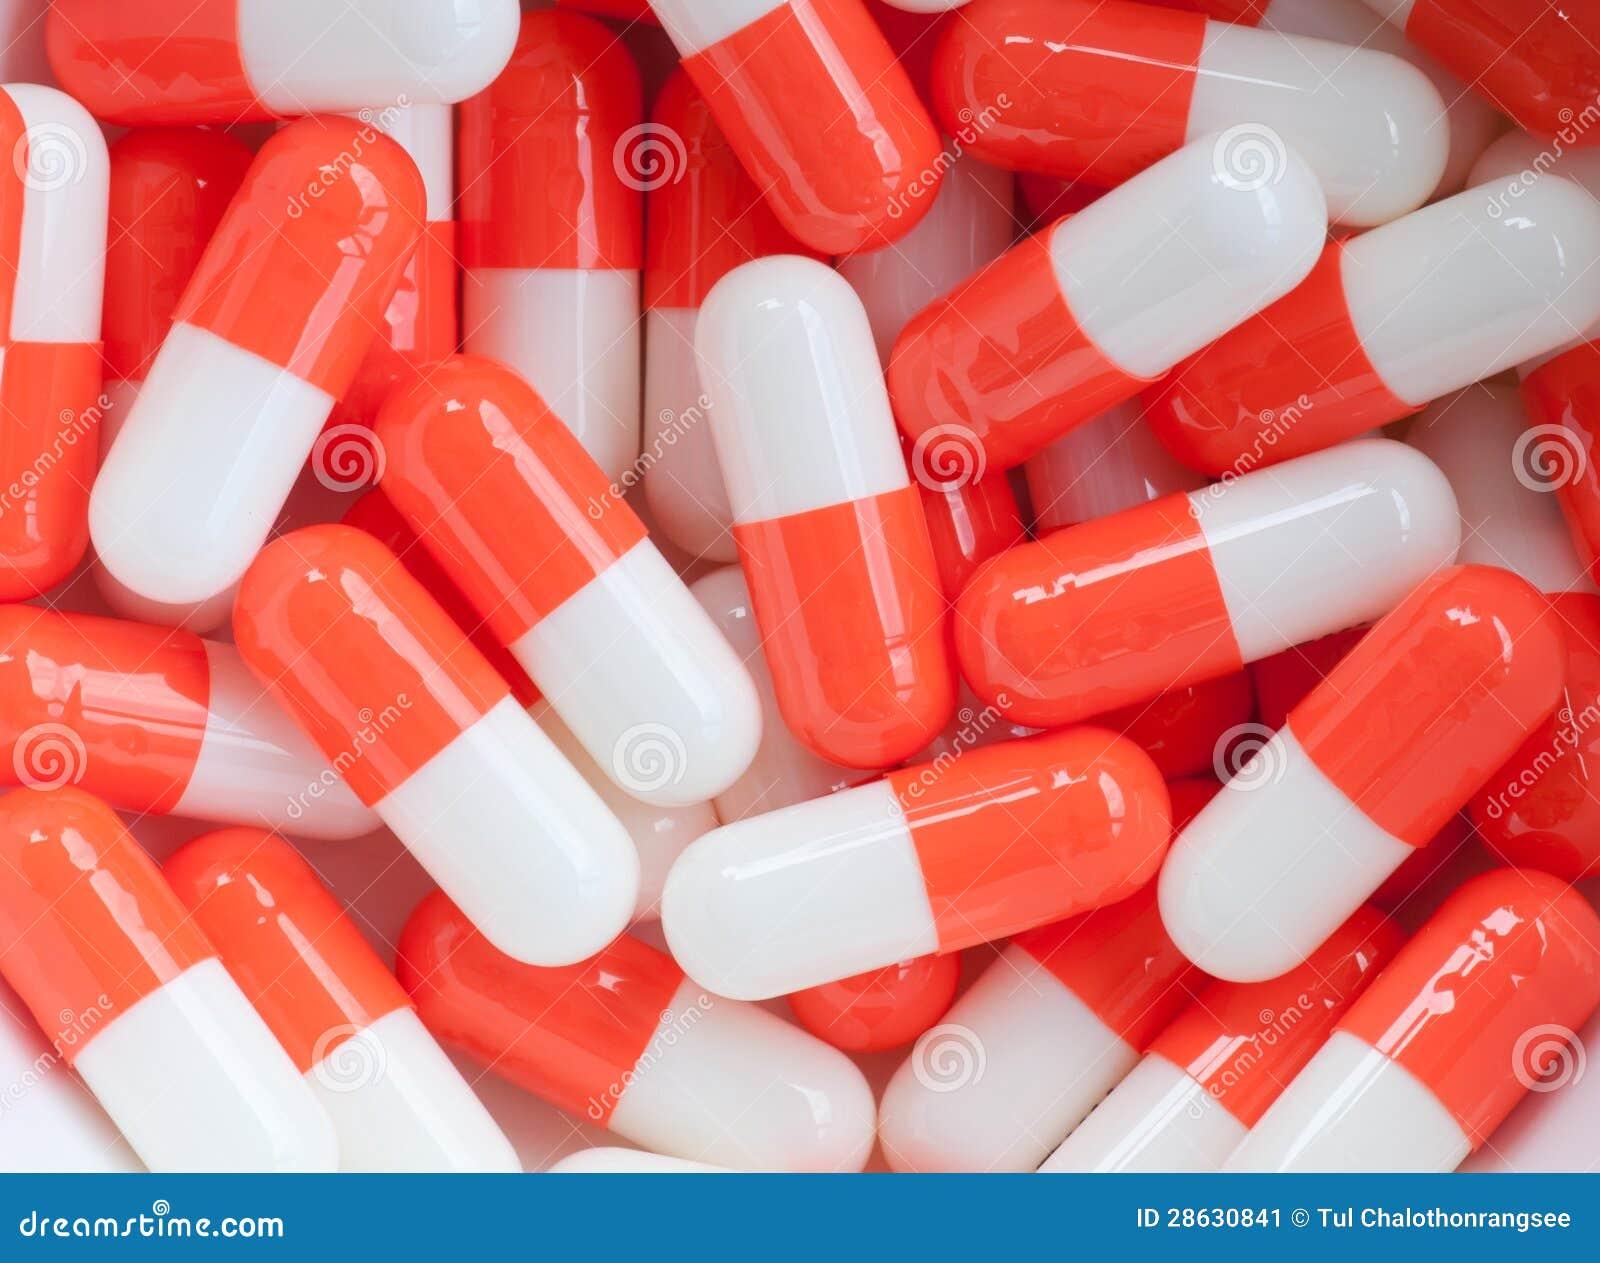 White And Orange Capsule Pills Stock Image Image 28630841